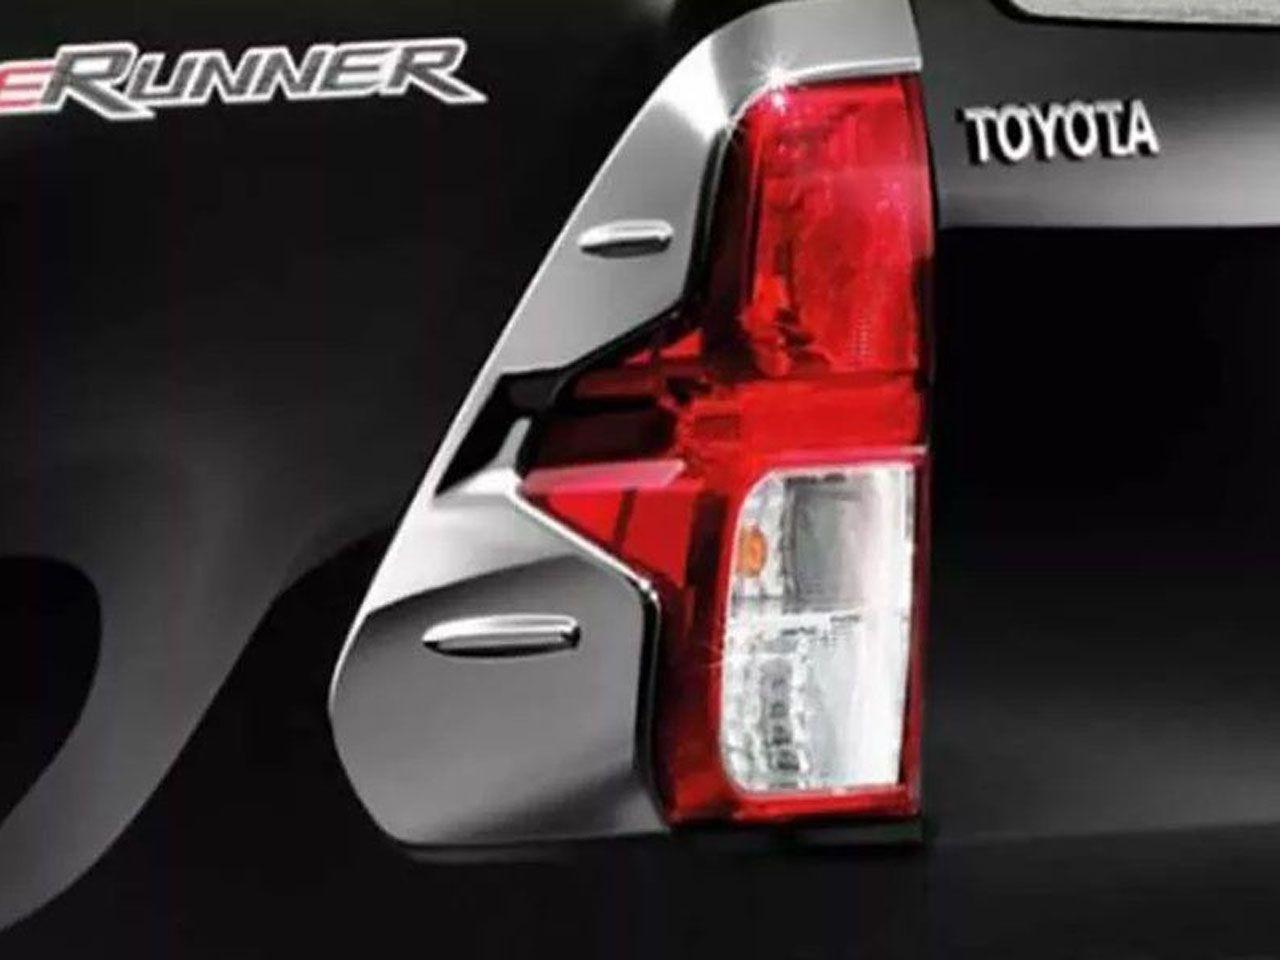 Aplique Cromado da Lanterna Hilux STD SR SRV SRX Cabine Simples  - Mirai Peças Toyota